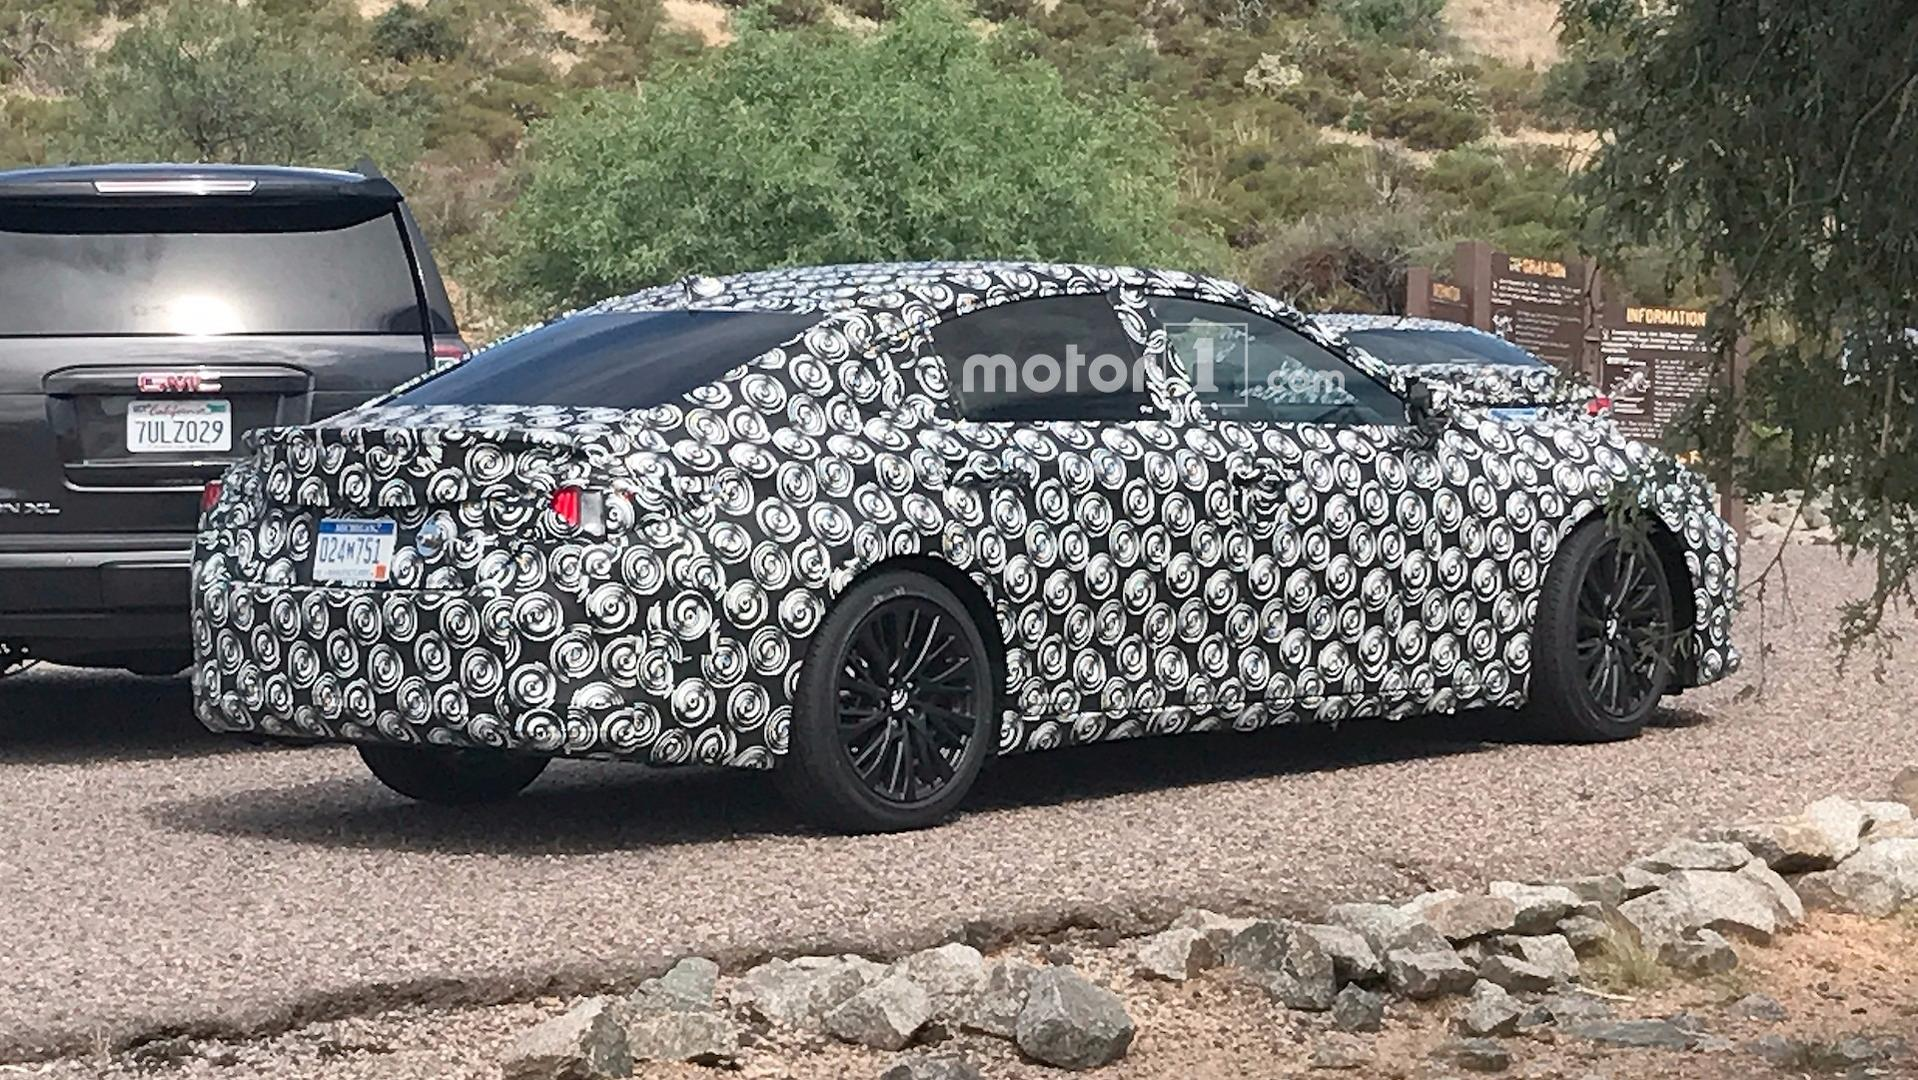 2019 Lexus ES Spied In The Desert With Mercedes Audi Rivals